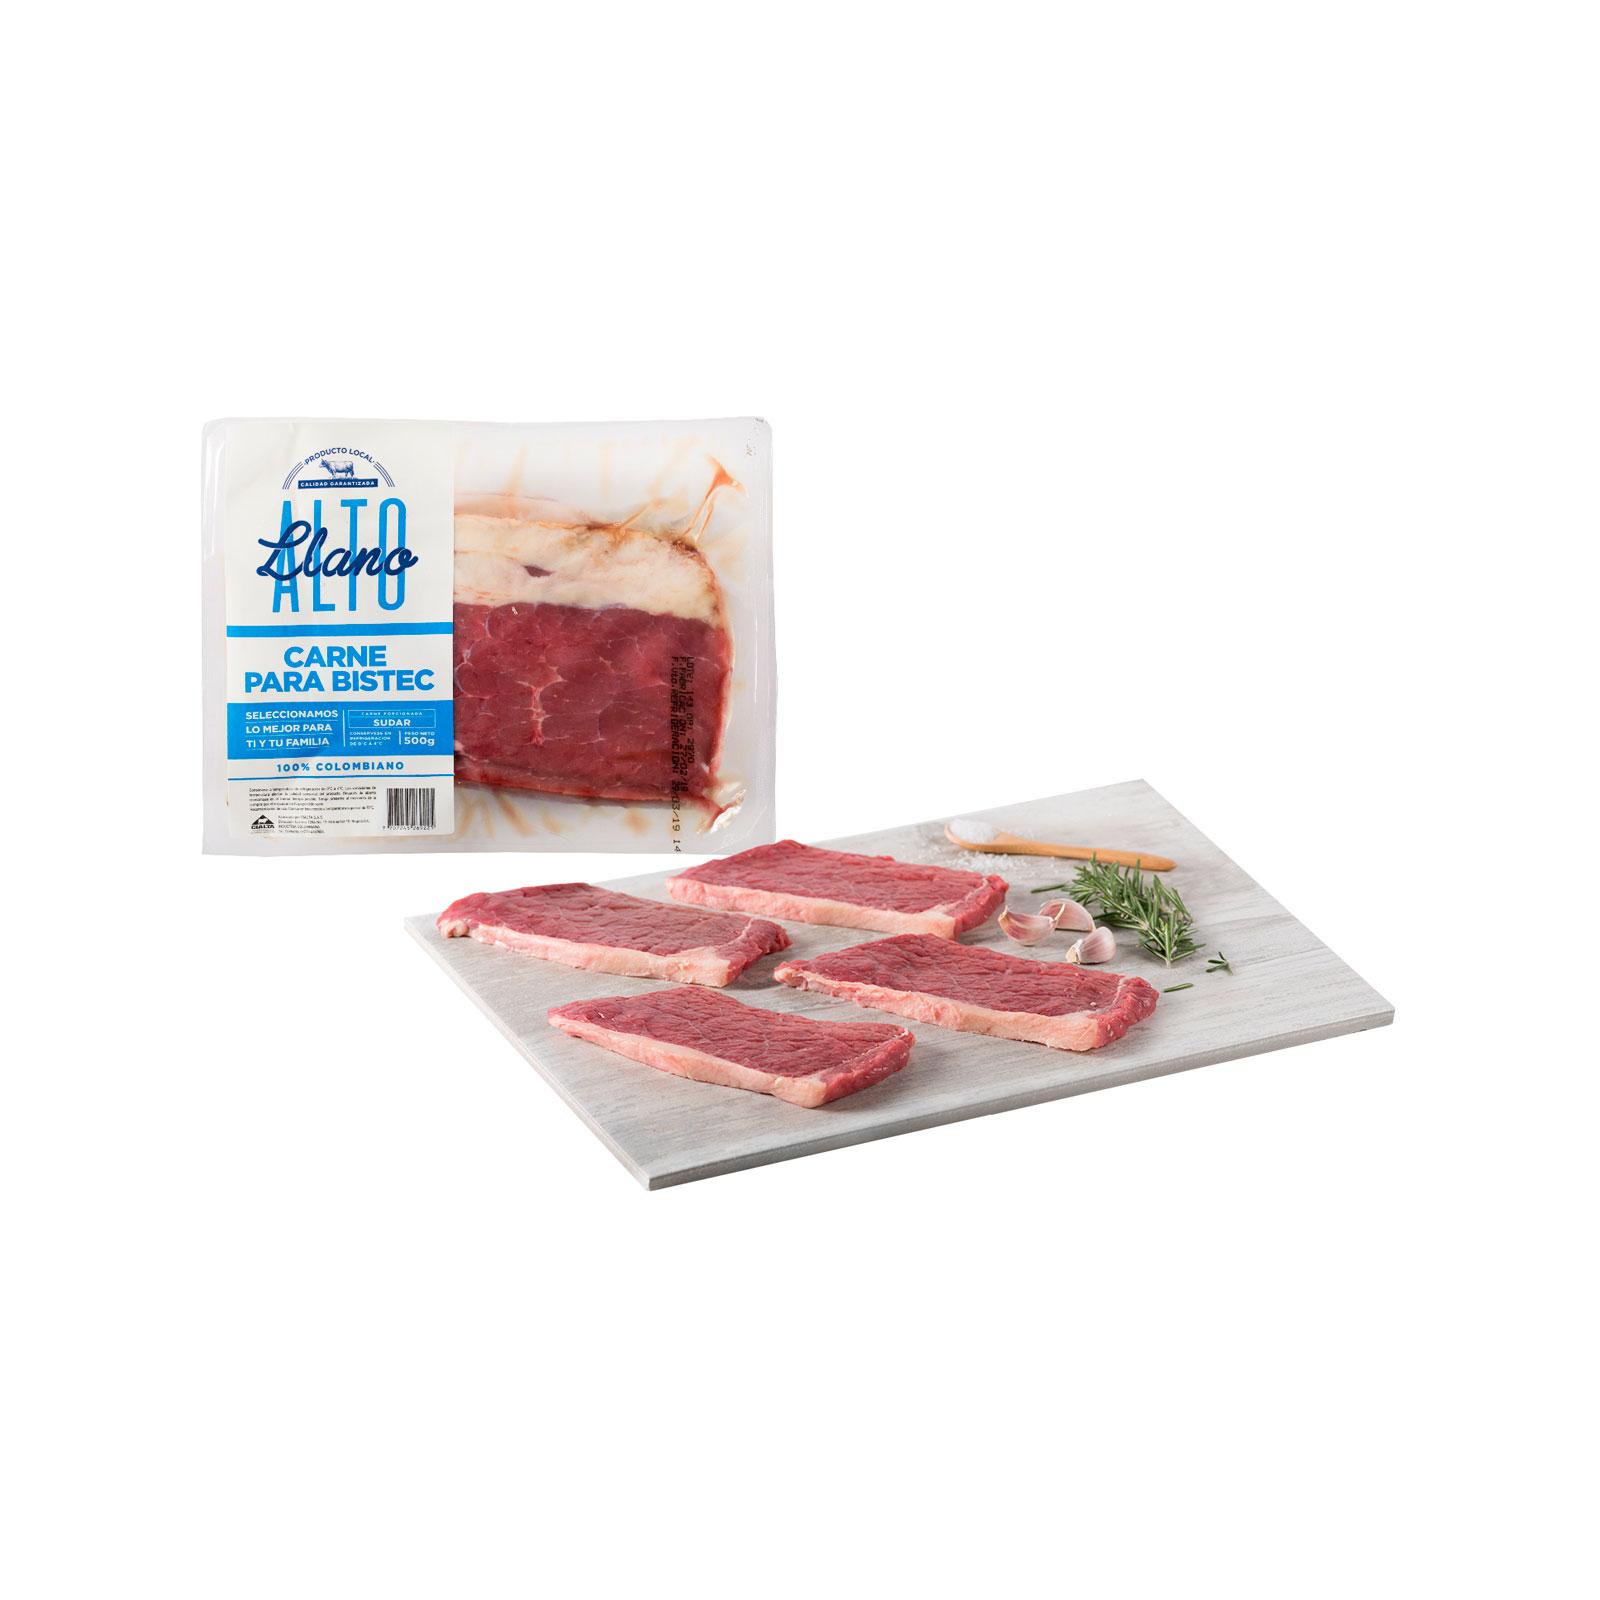 Carne Para Bistec Llano Alto (Cialta)